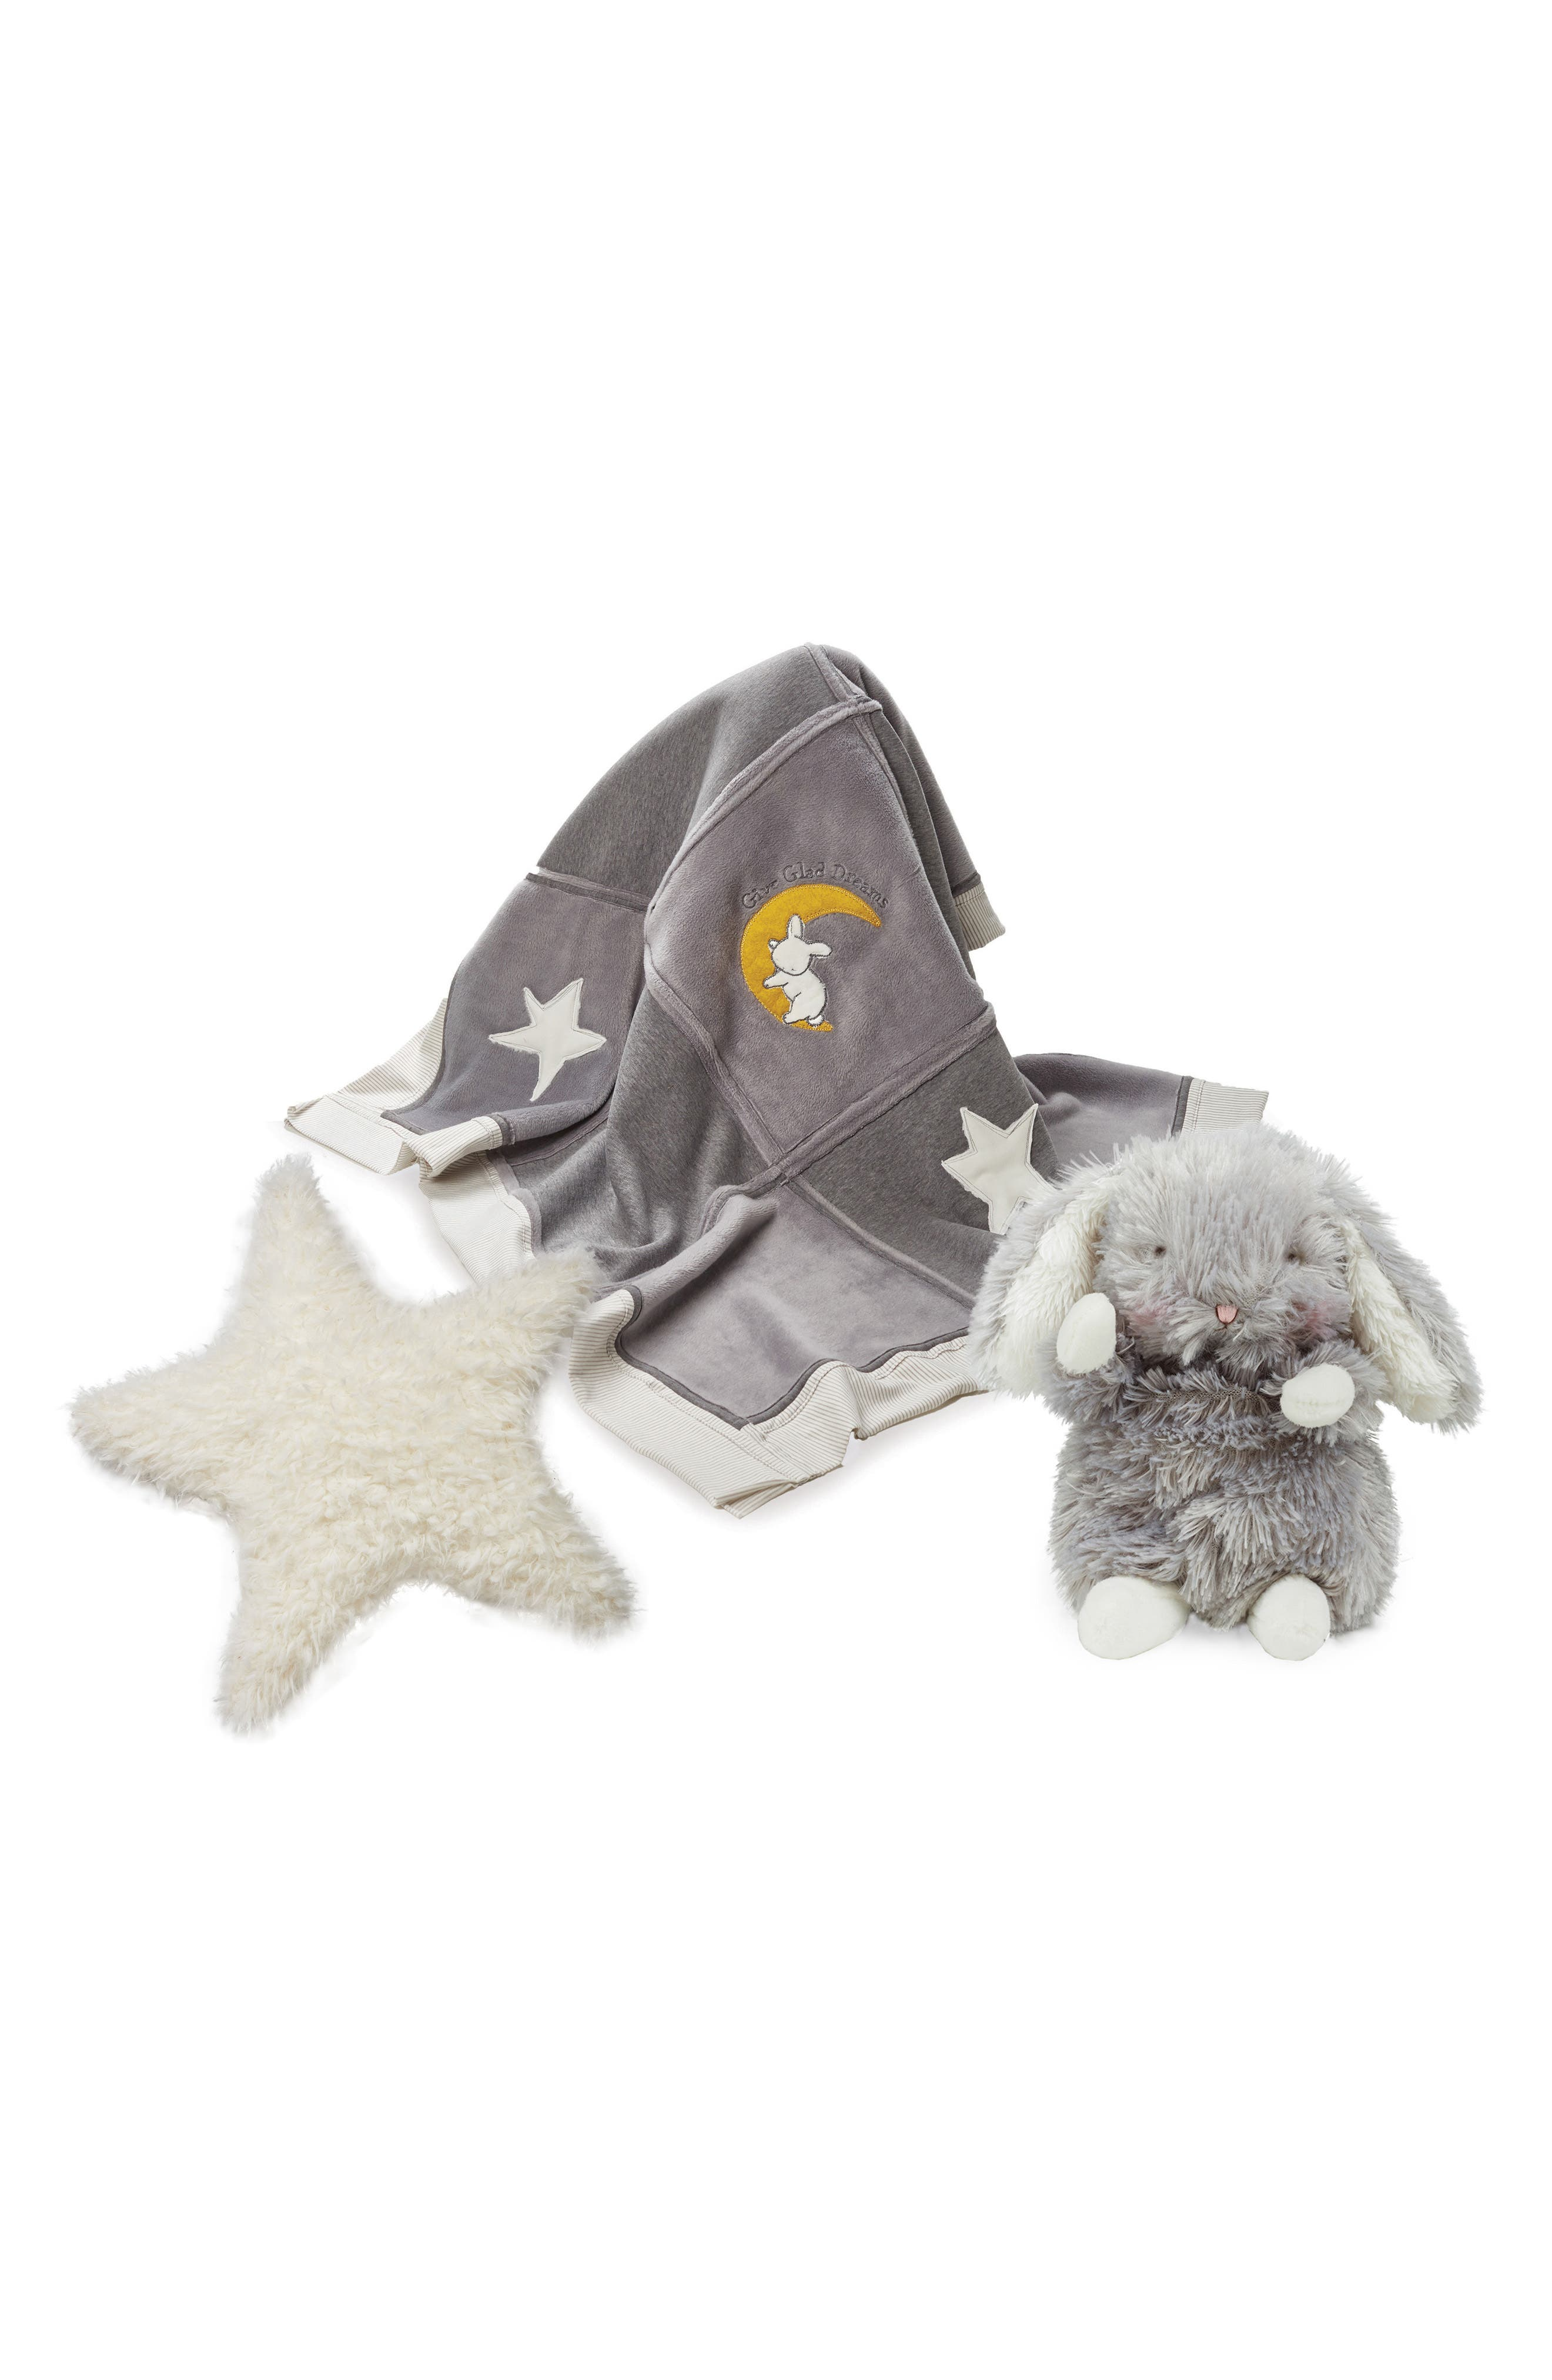 Glad Dreams Blanket, Pillow & Stuffed Animal Set,                             Main thumbnail 1, color,                             020